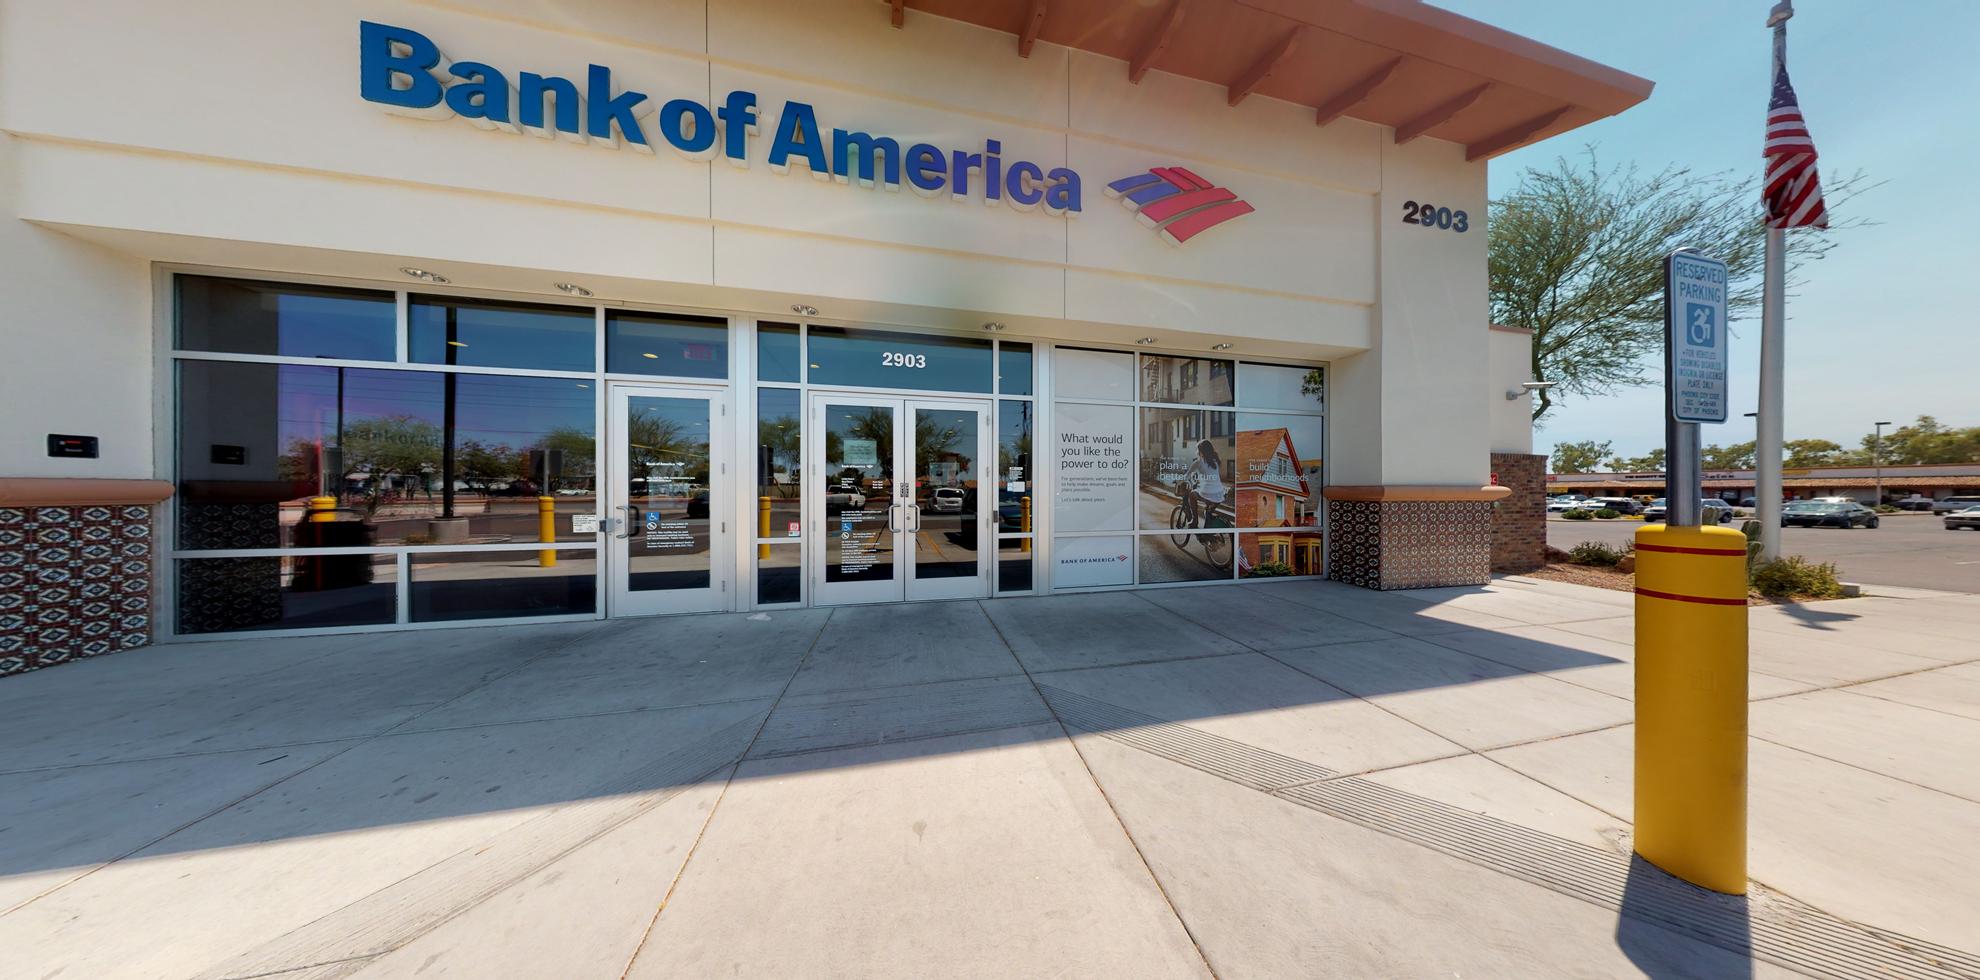 Bank of America financial center with drive-thru ATM   2903 W Bell Rd, Phoenix, AZ 85053